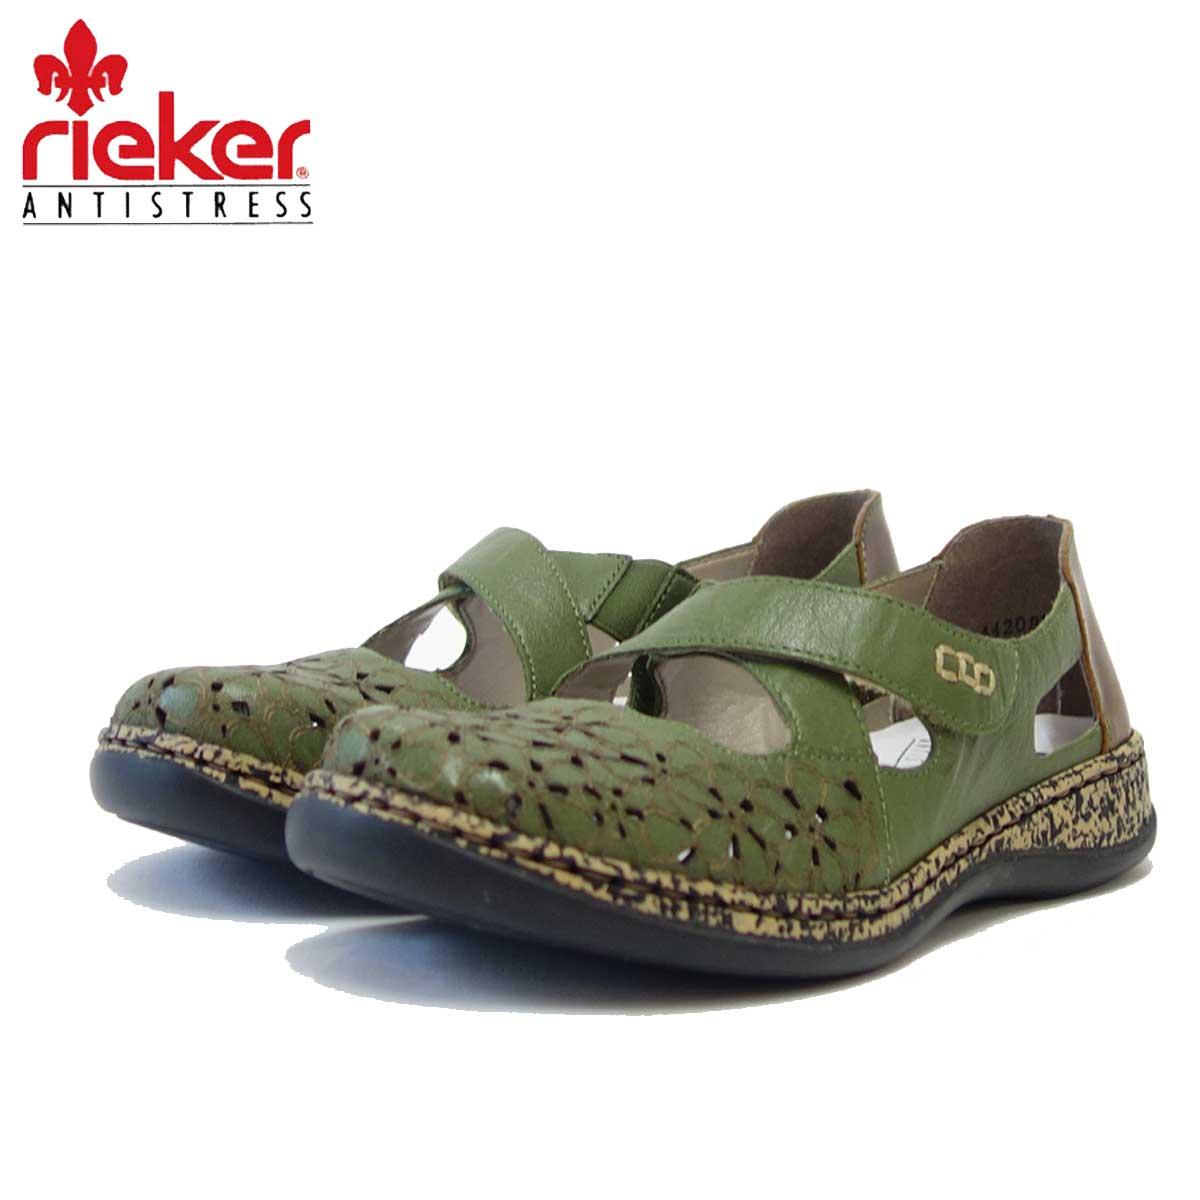 rieker リーカー 463H4 52 グリーン (レディース) クッション性の良いお洒落ストラップシューズ 「靴」